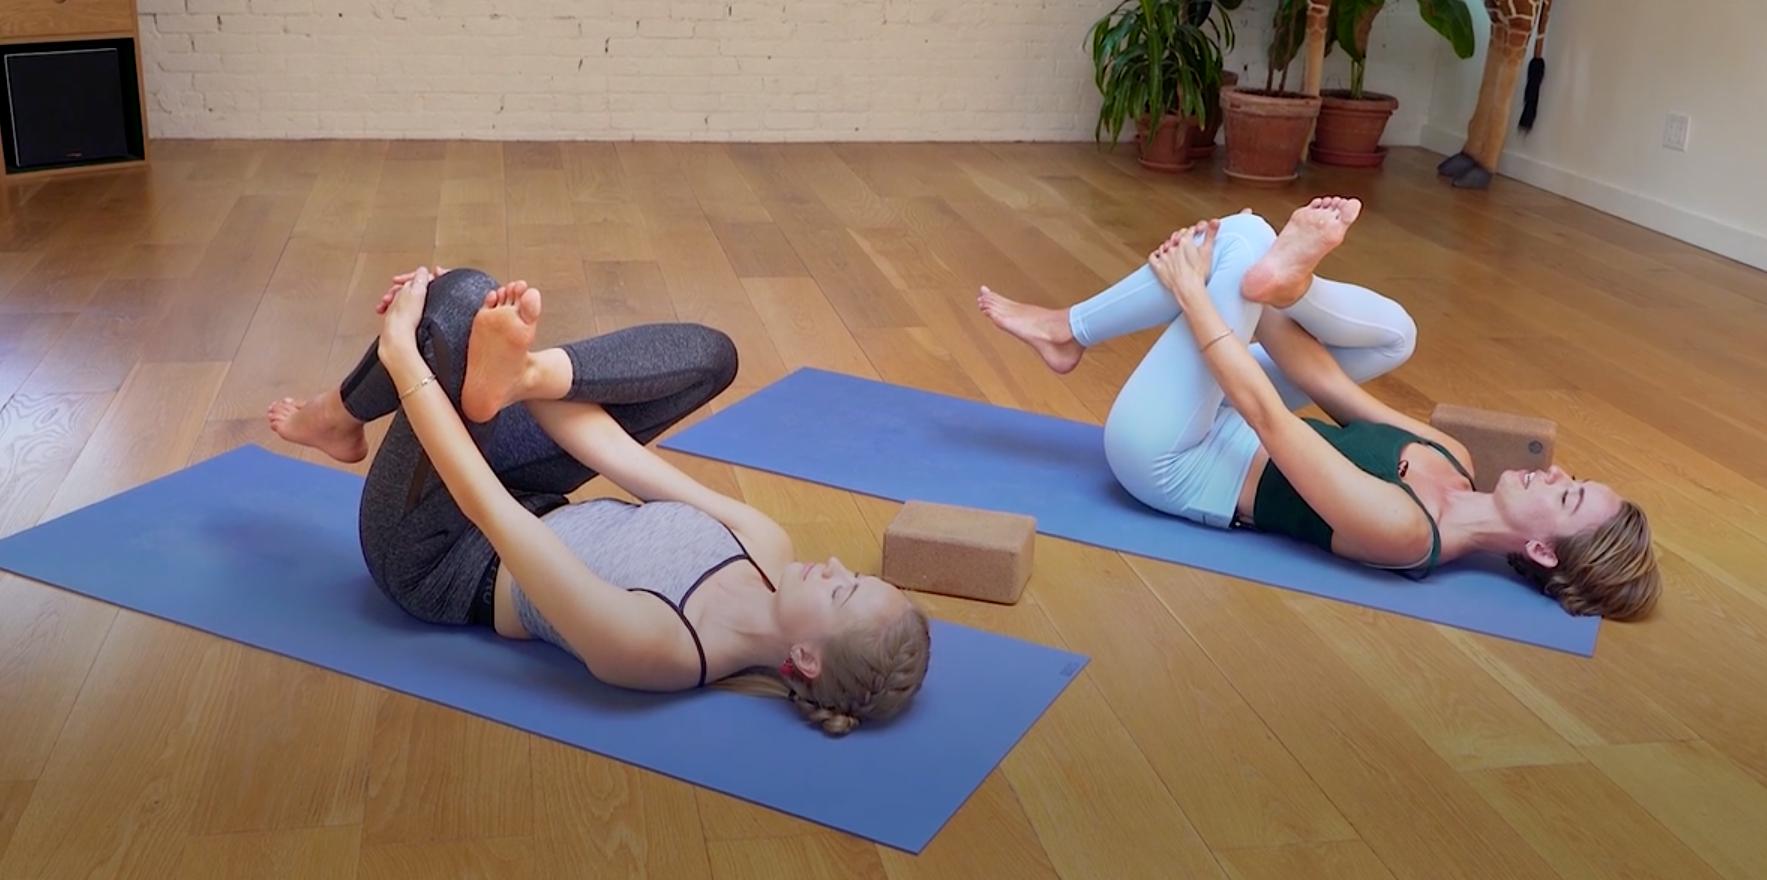 Krissy Jones and Chloe Kernaghan of Sky Ting yoga.